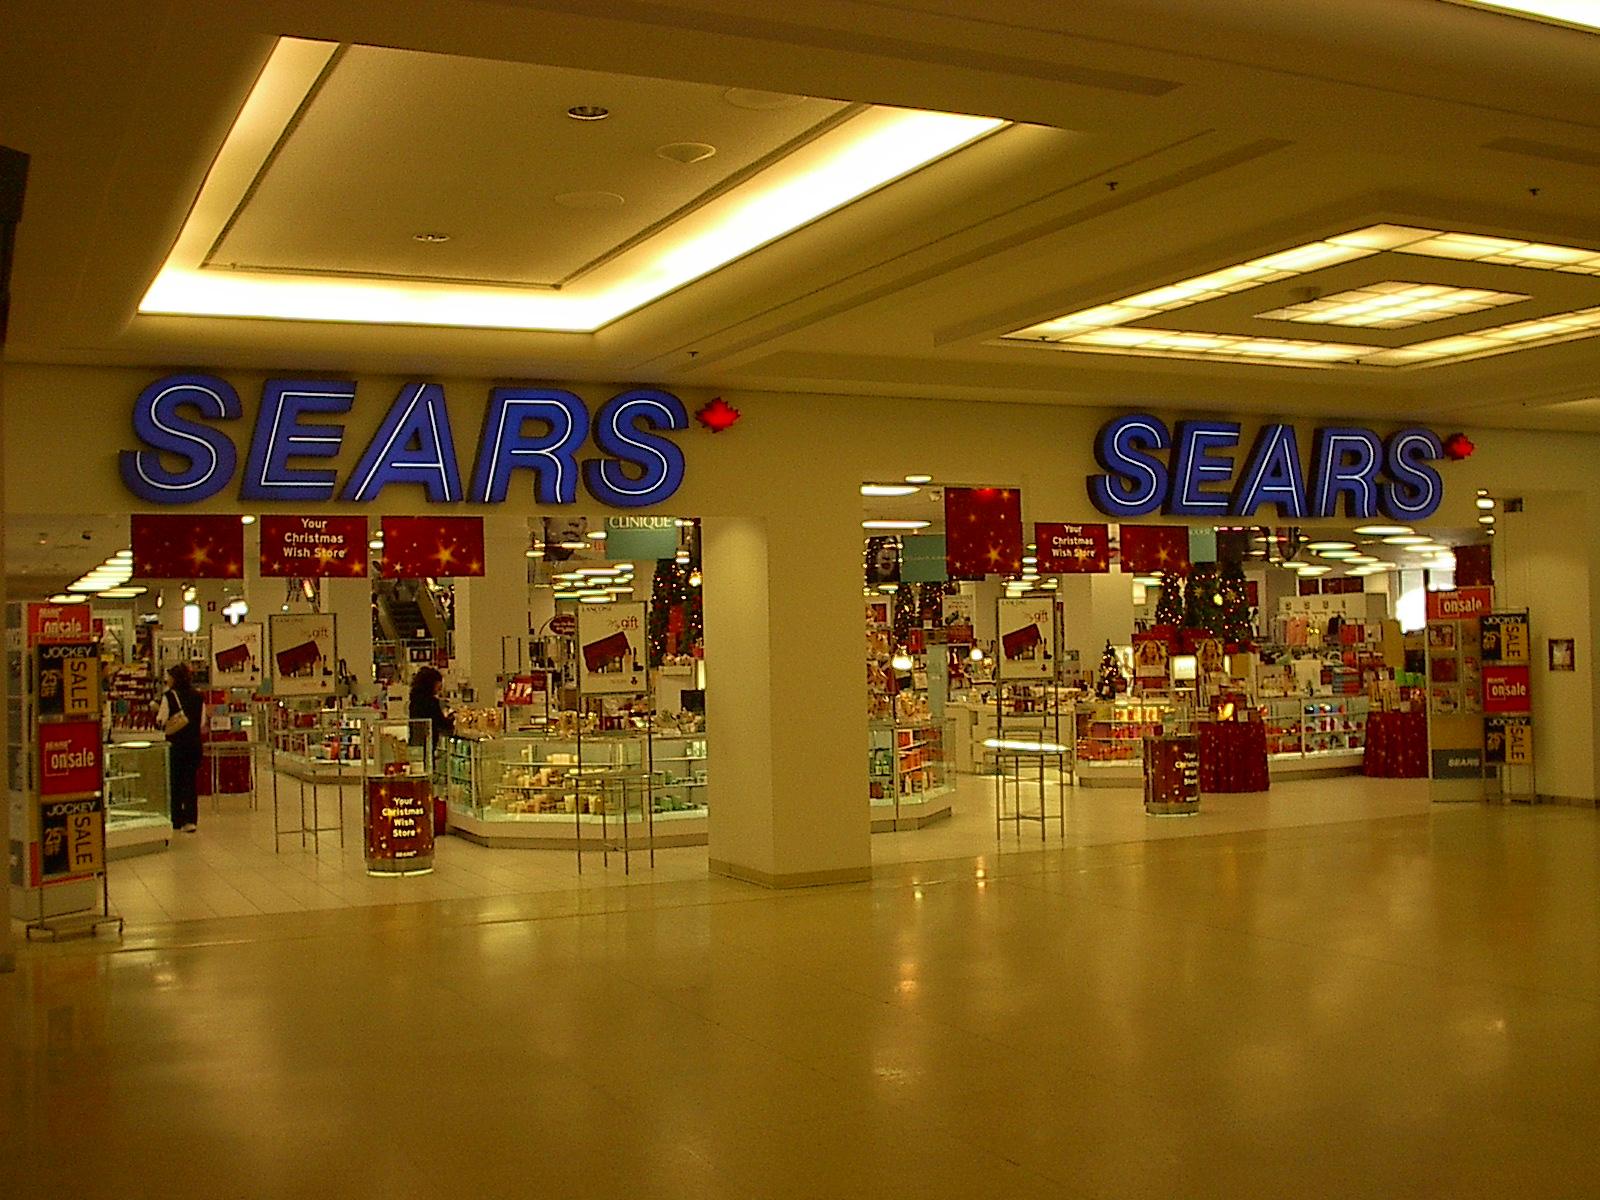 Best Jc Penny Portraits in Sacramento, CA - Yelp Sears photo studio arden mall